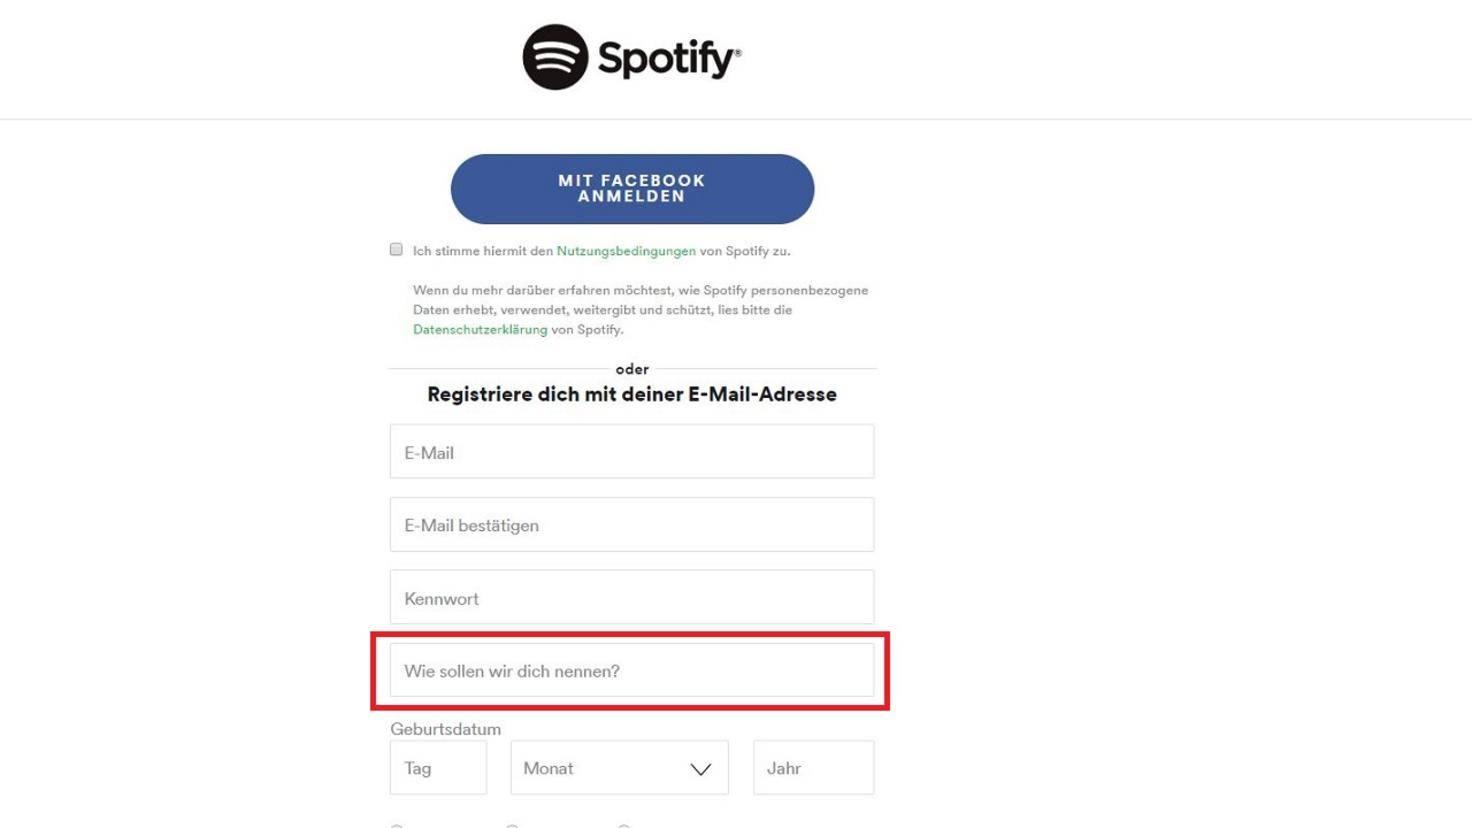 E mail adresse neuer name